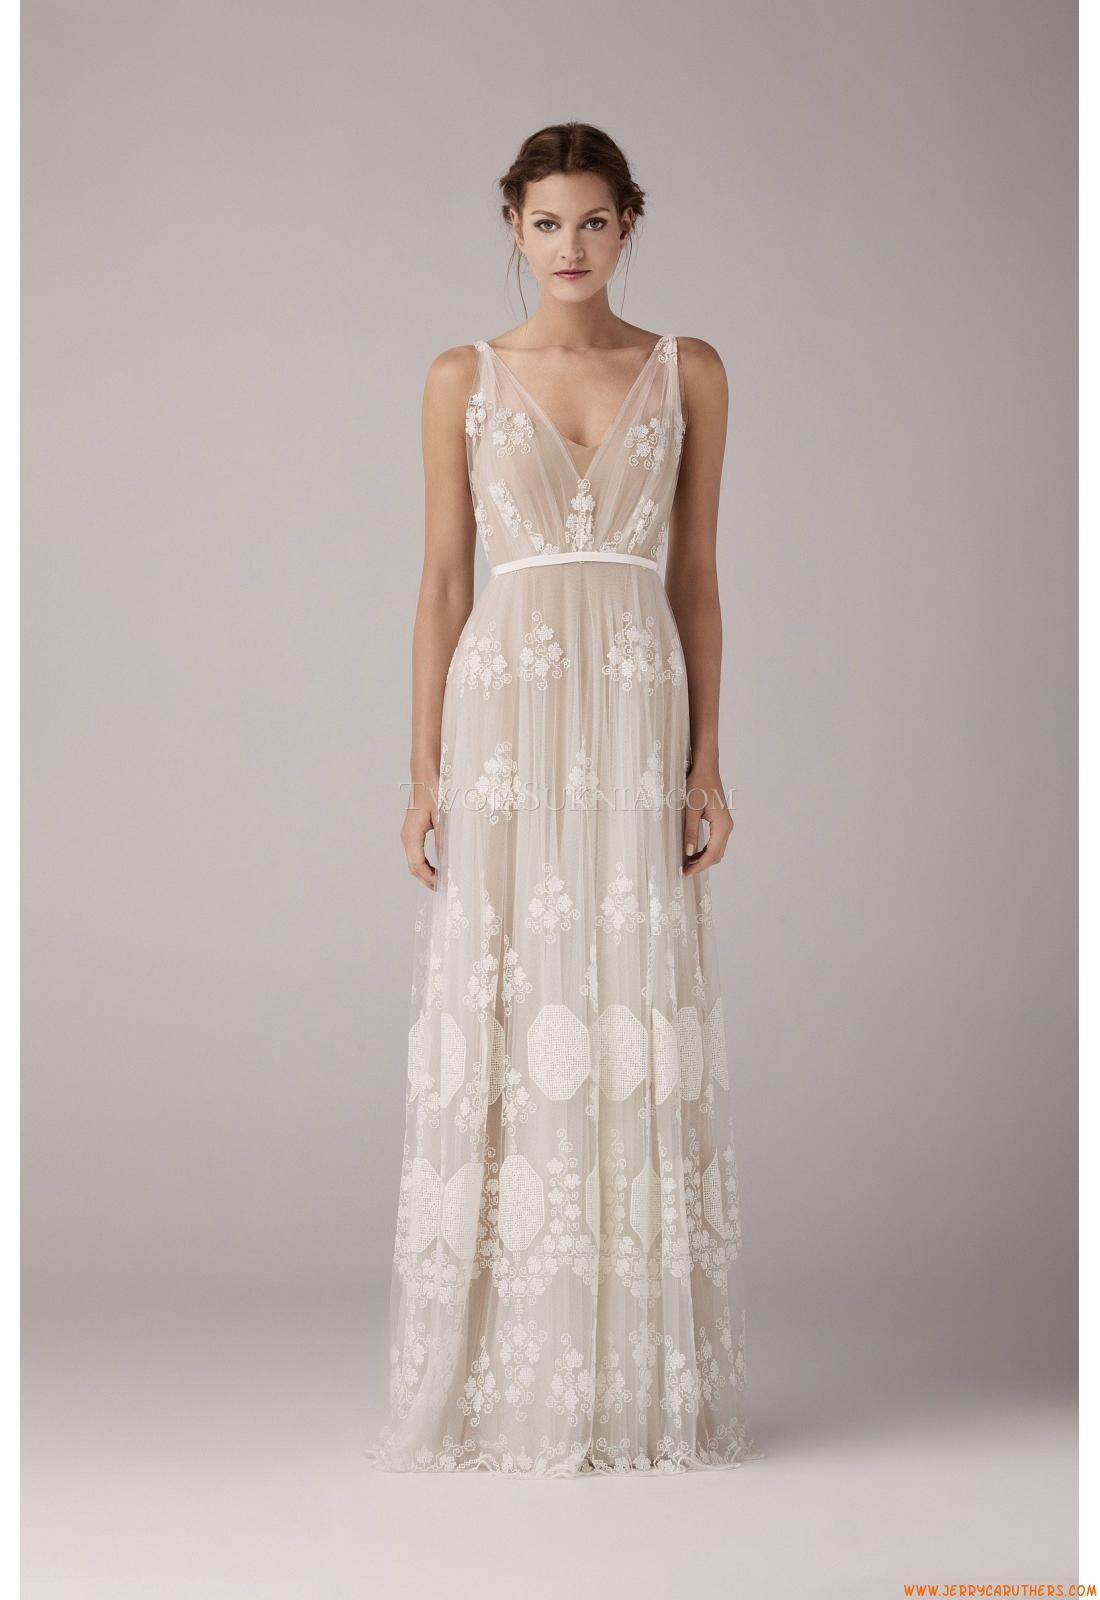 Trouwjurken Anna Kara May Nude 2014 | vintage dresses for wedding ...